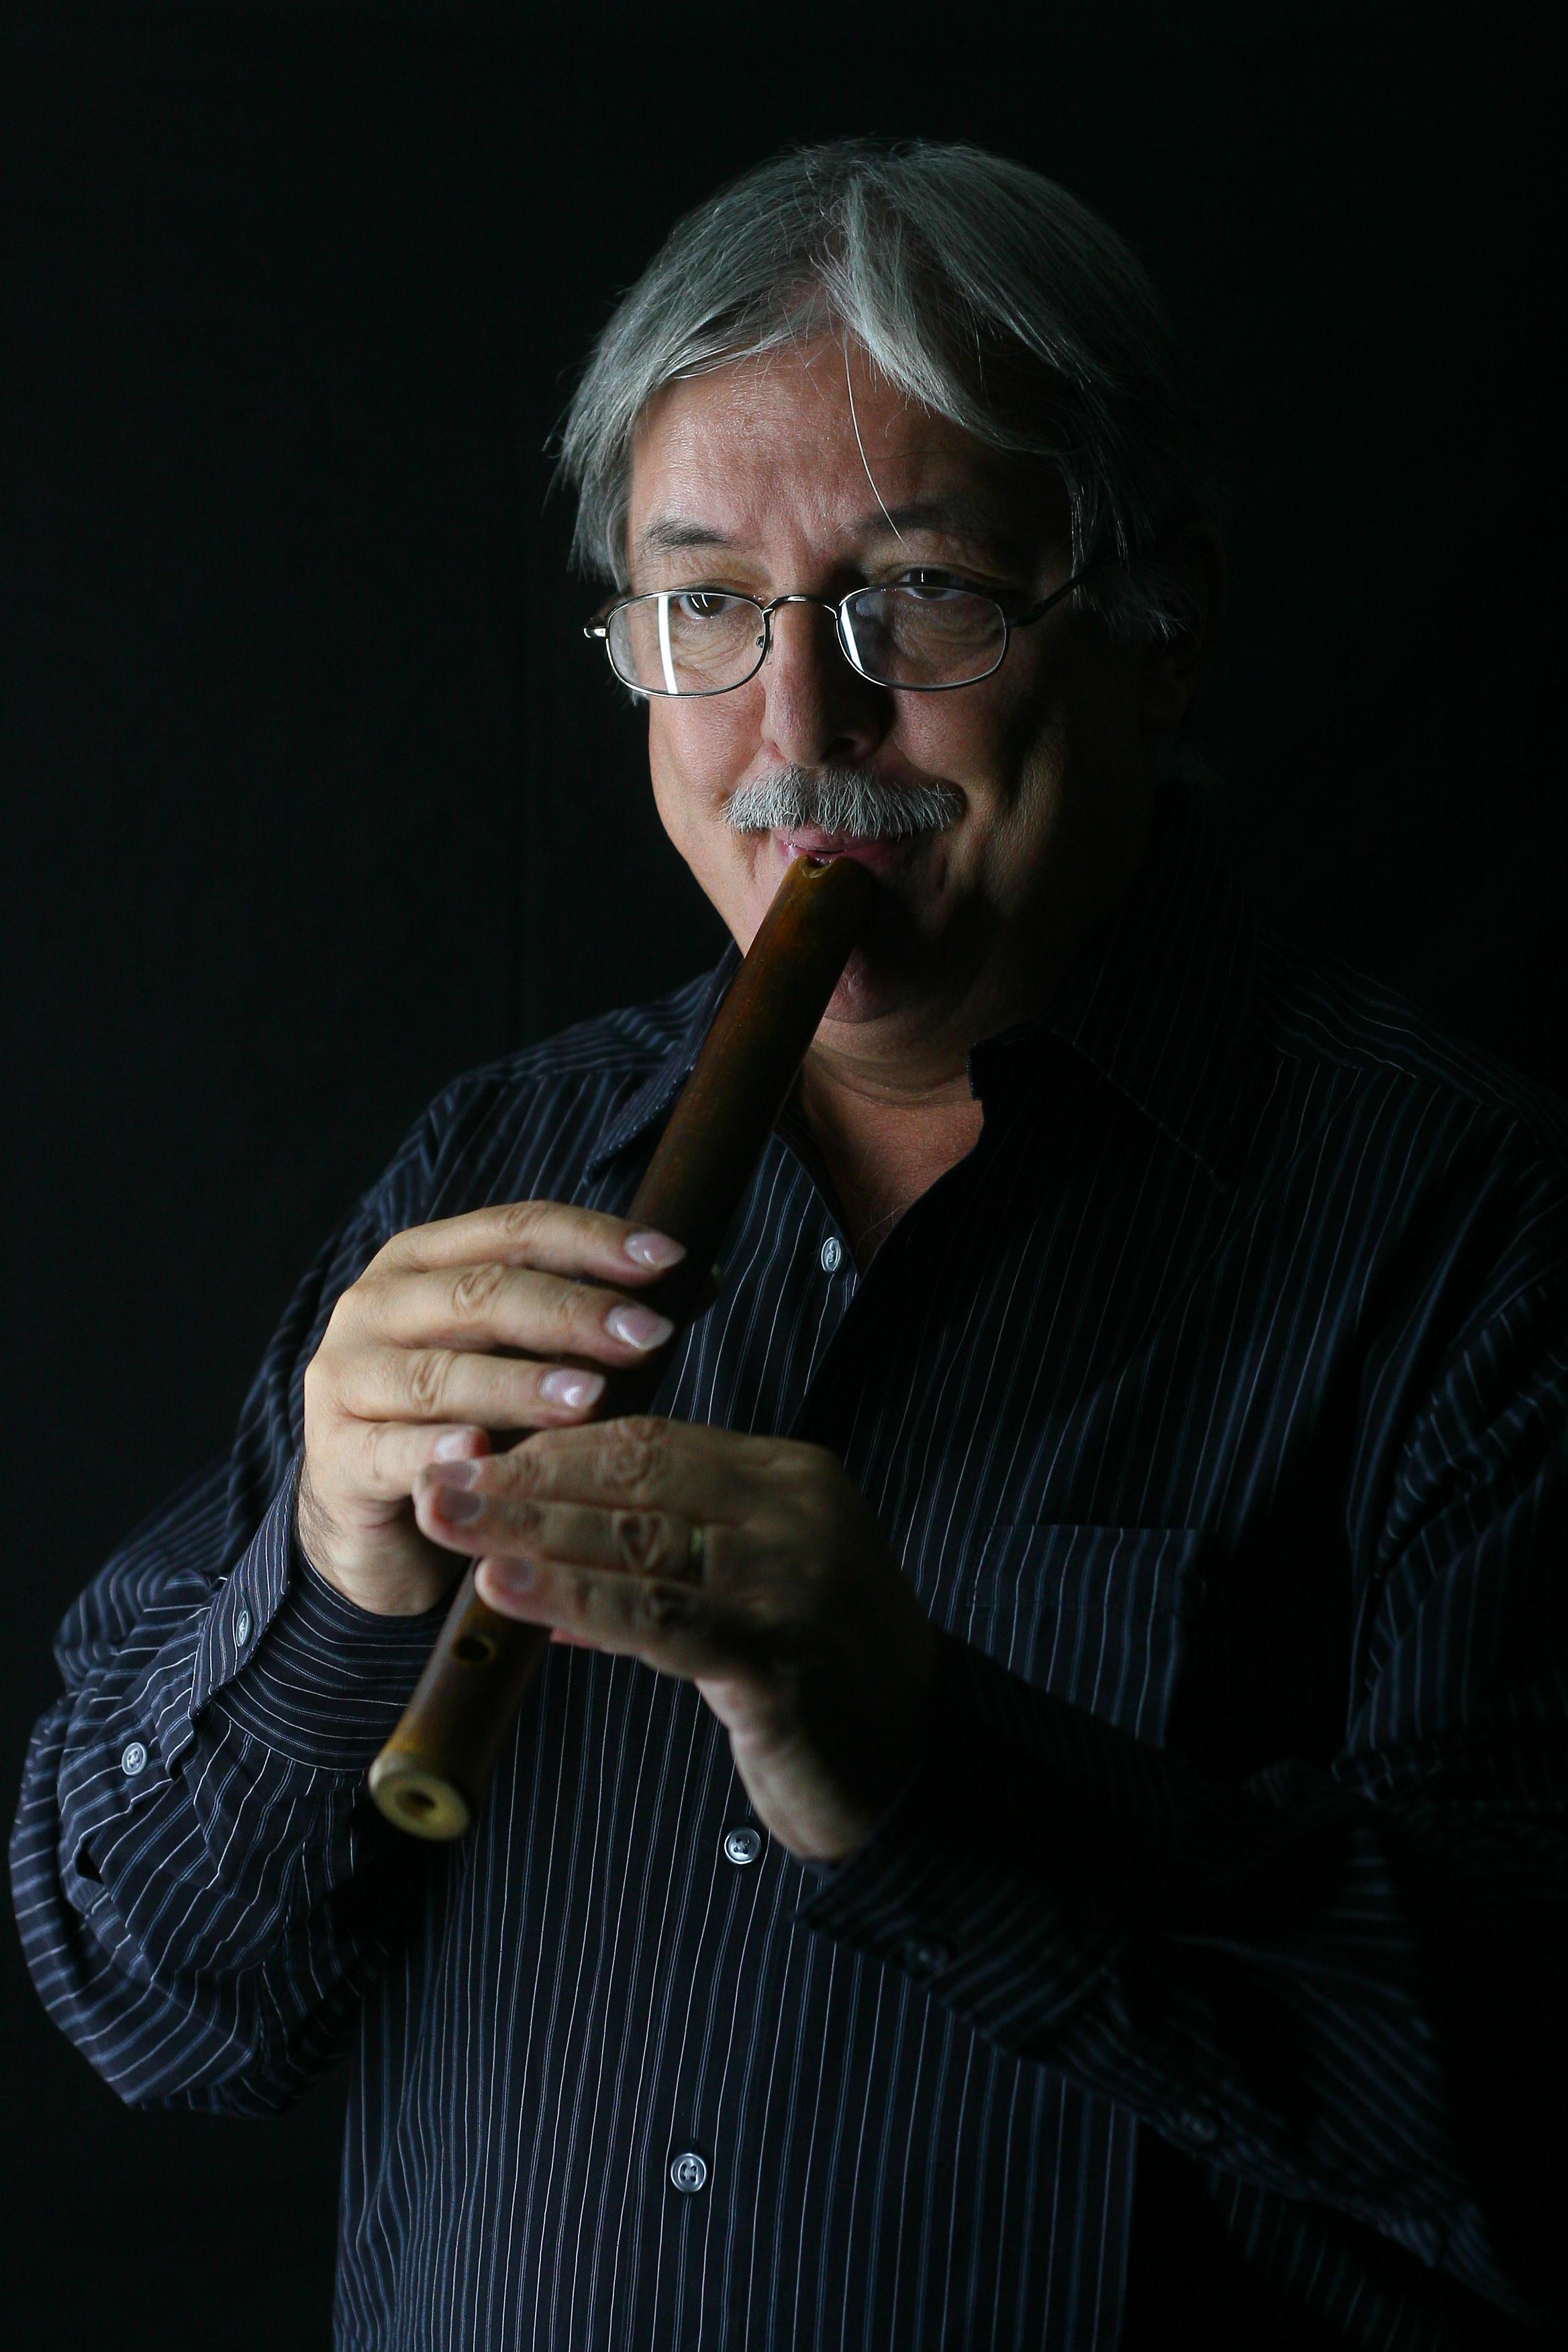 Marcelo Coulón miembro histórico del conjunto